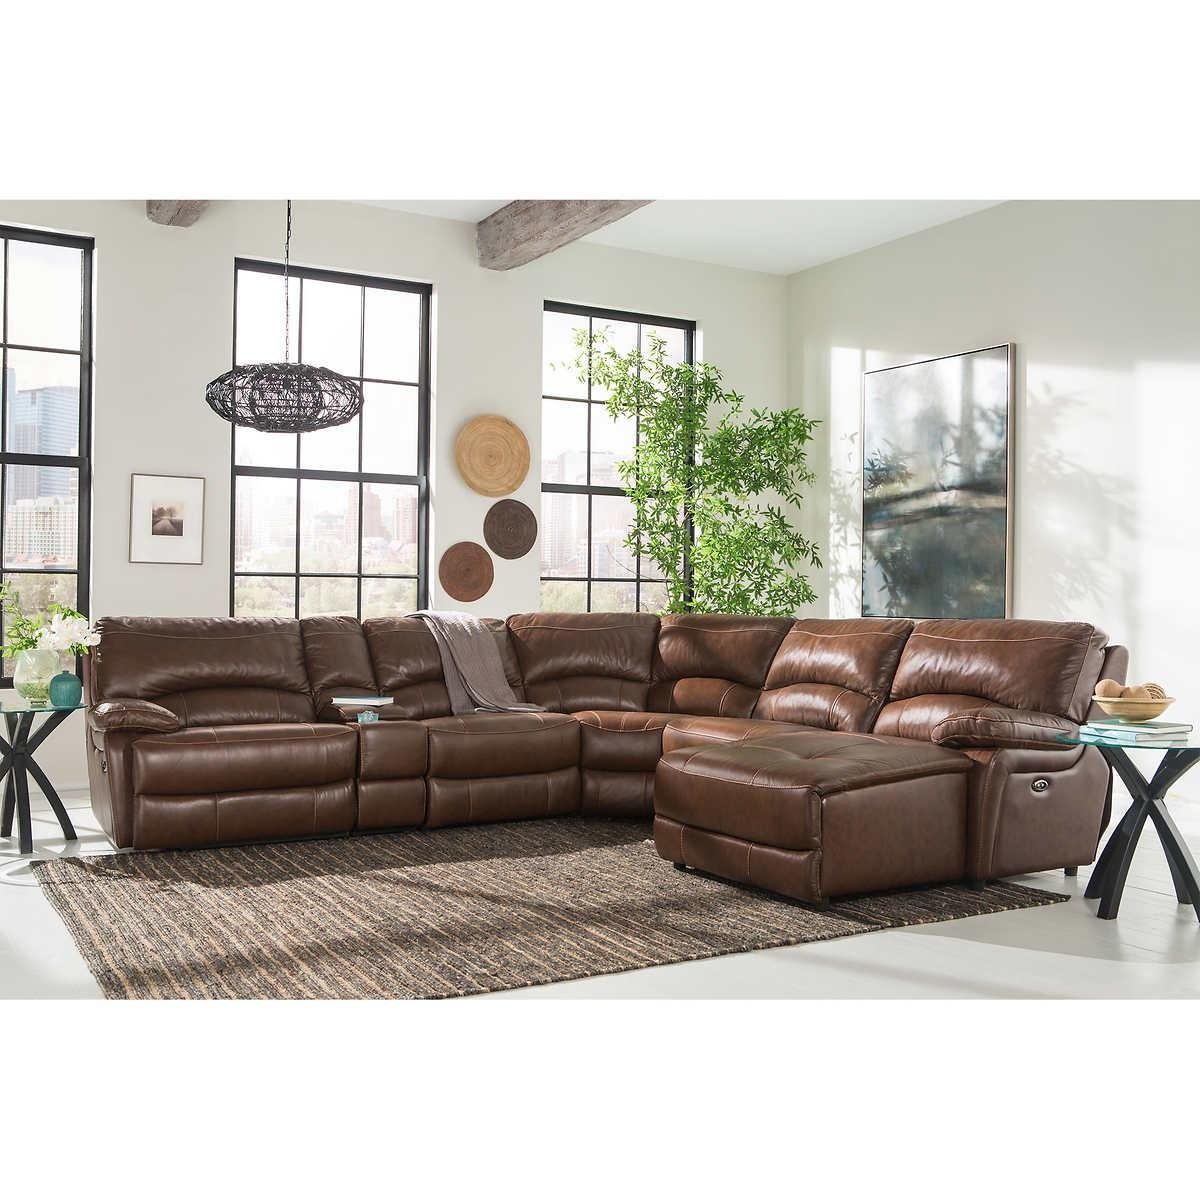 Modular Pit Group Sofa Amazing Modular Leather Sectional Sofa – Ftfpgh With Leather Modular Sectional Sofas (Image 14 of 20)